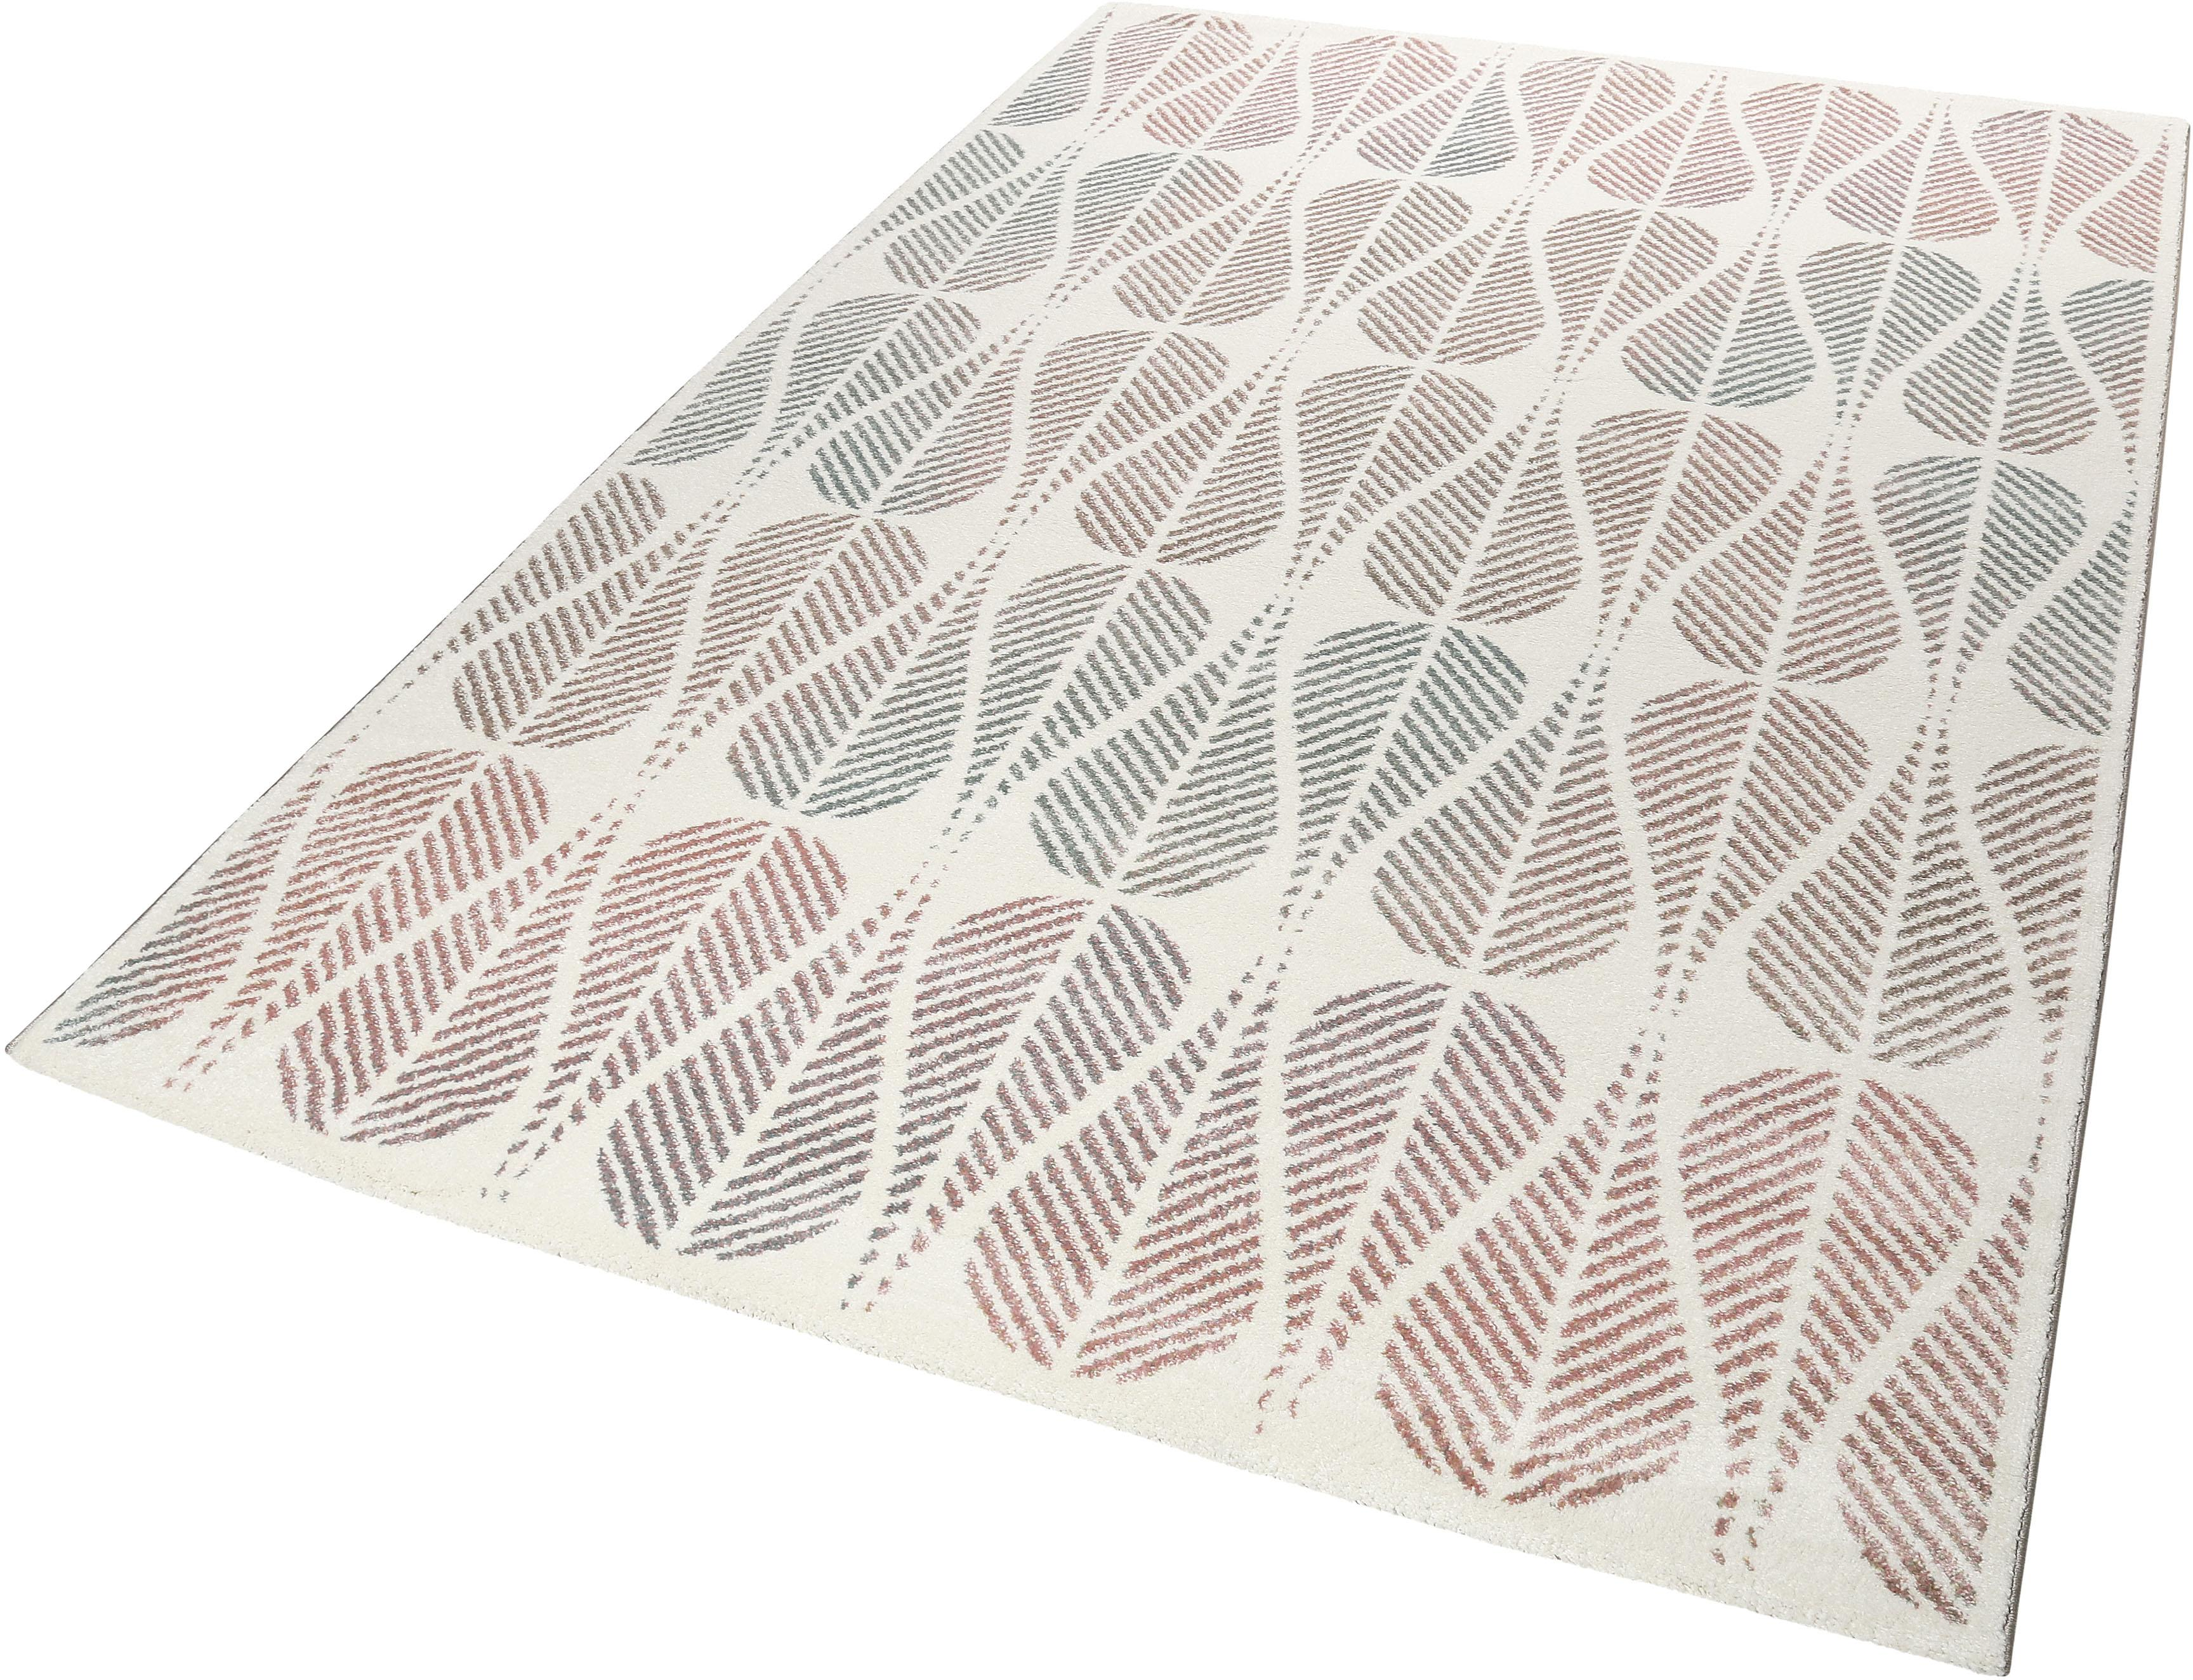 Teppich Zeno Esprit rechteckig Höhe 13 mm maschinell gewebt